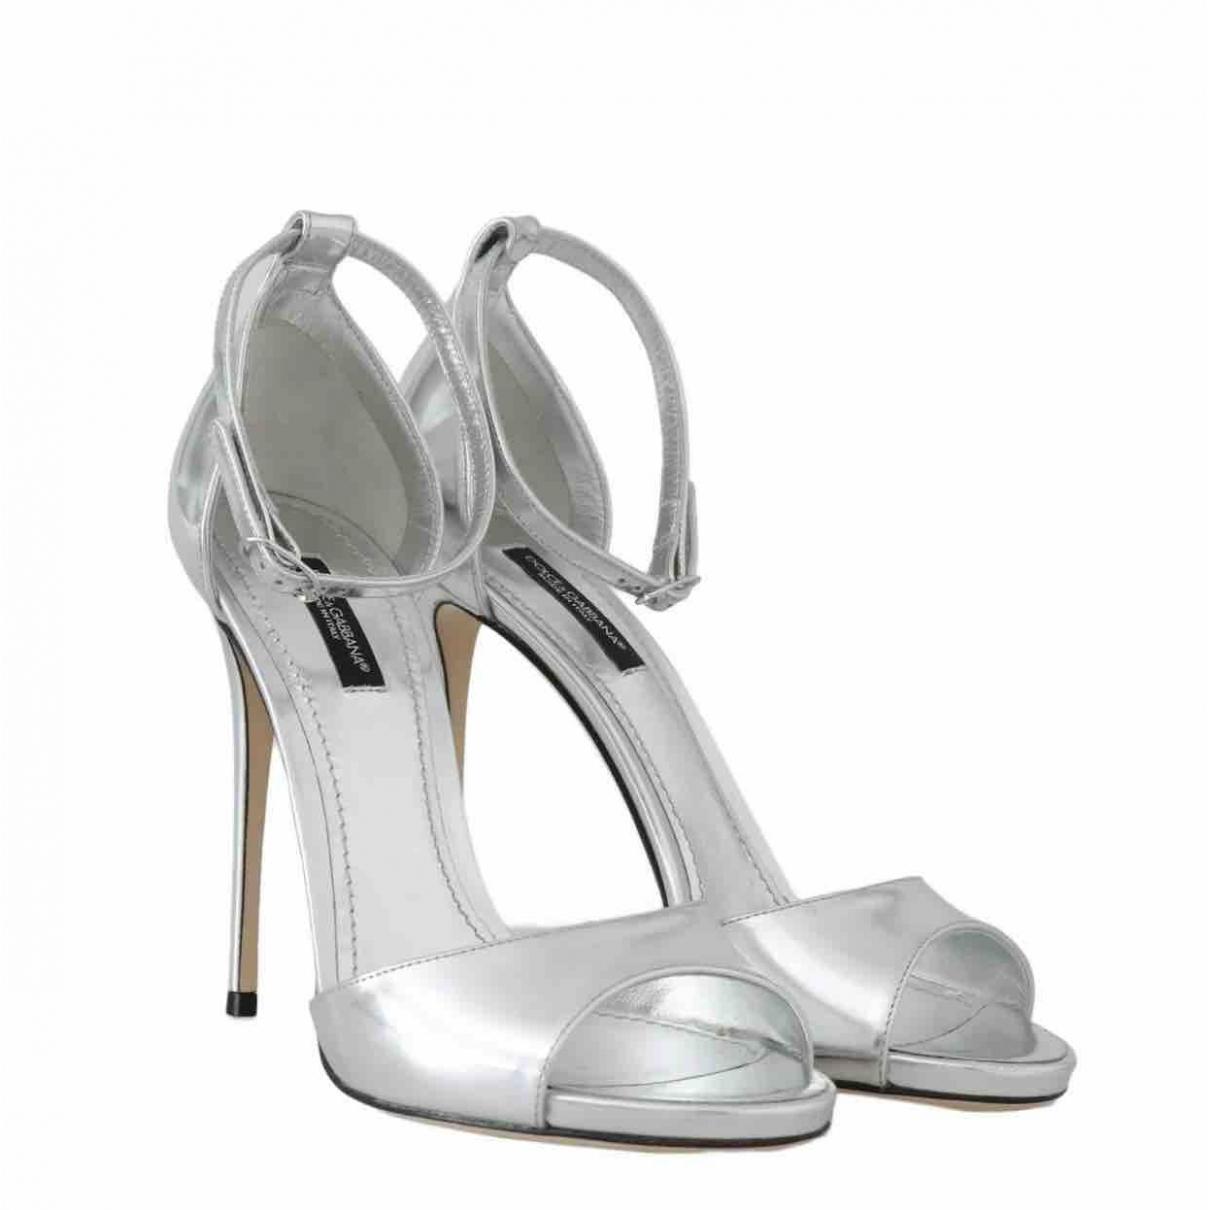 Dolce & Gabbana \N Silver Leather Sandals for Women 38 EU